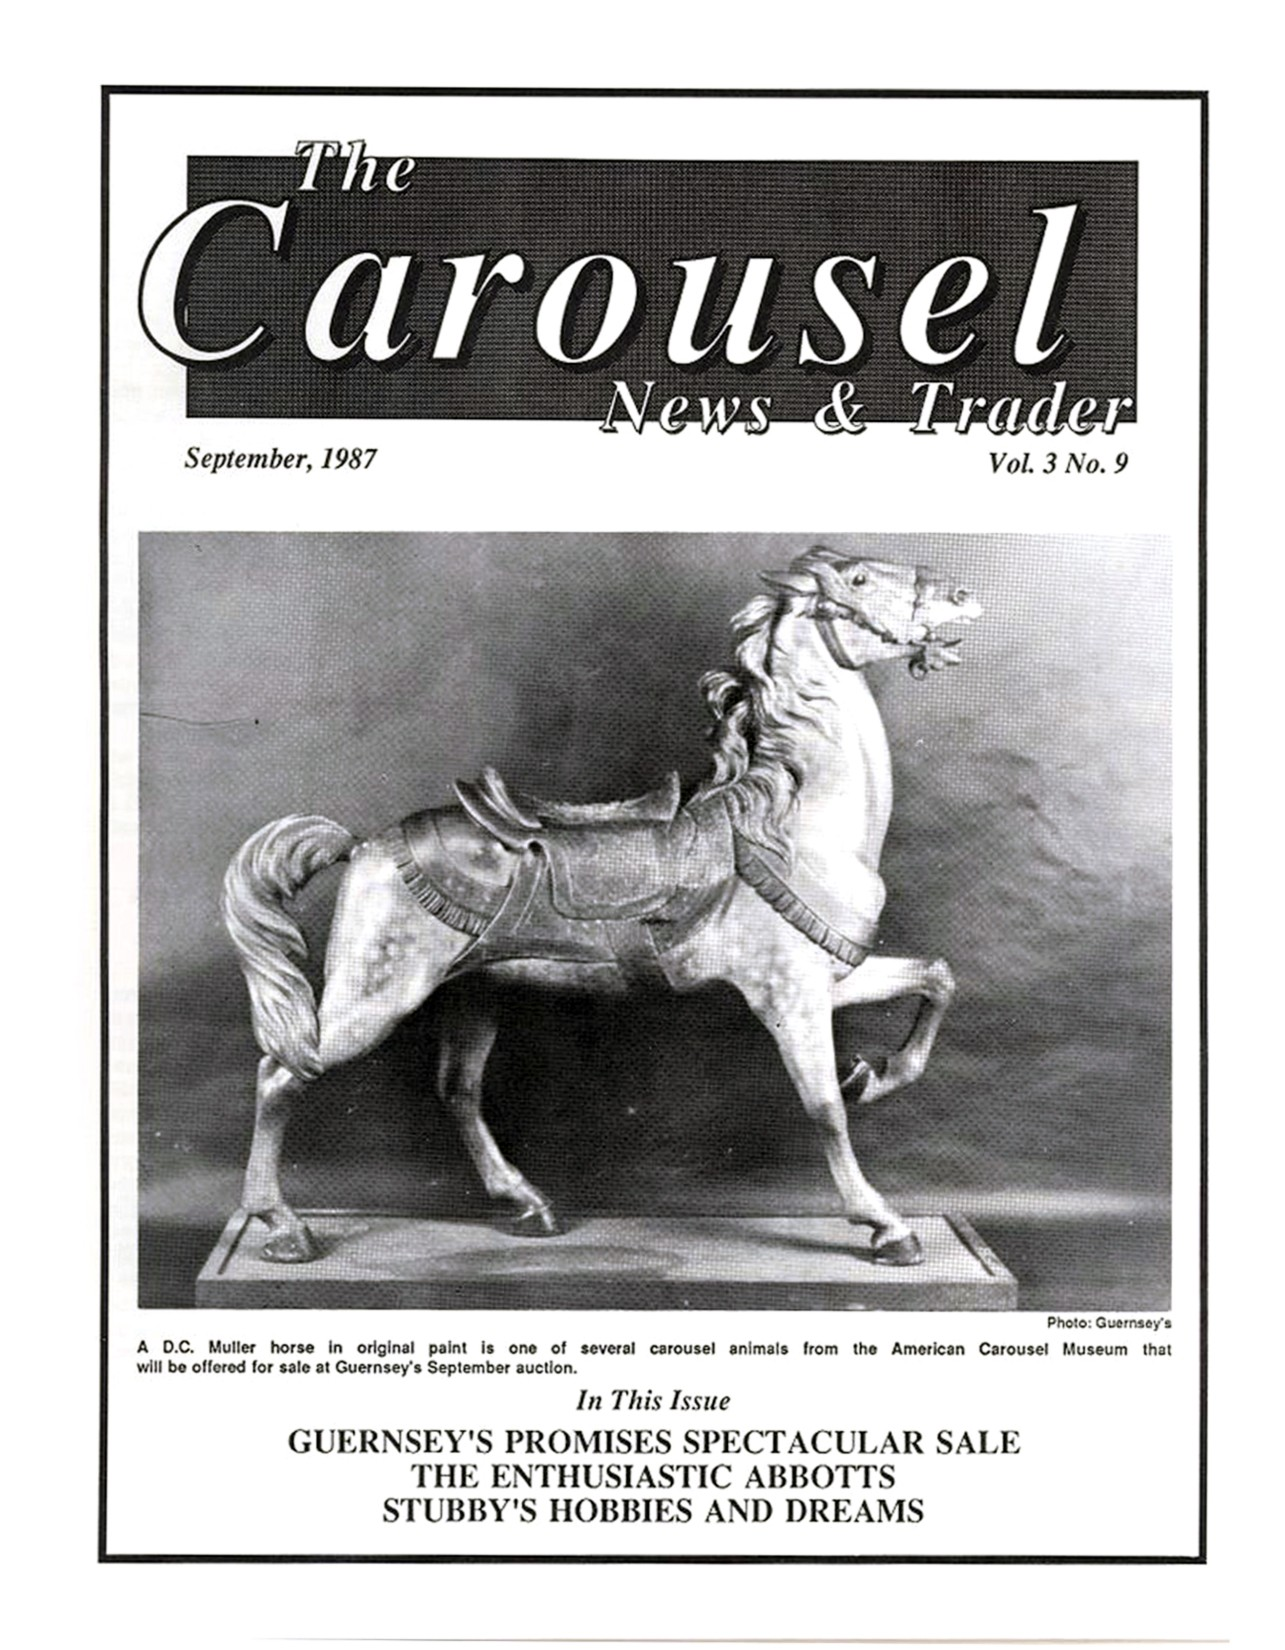 Carousel-News-cover-09_1987-D-C-Muller-Military-Horse-ACM-San-Fran